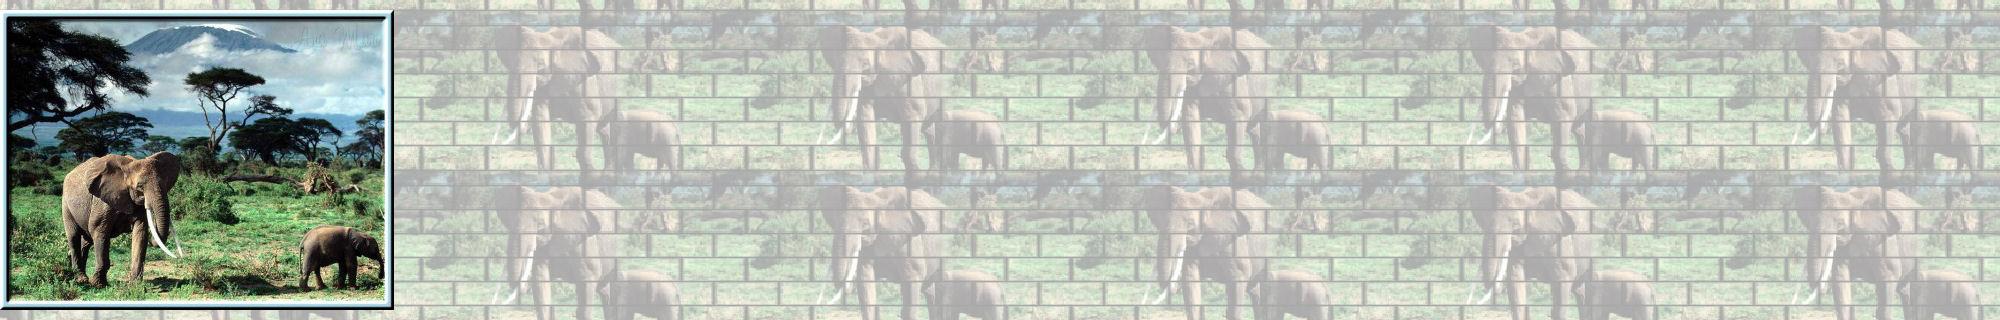 Fondo IM elefantes_002.imf